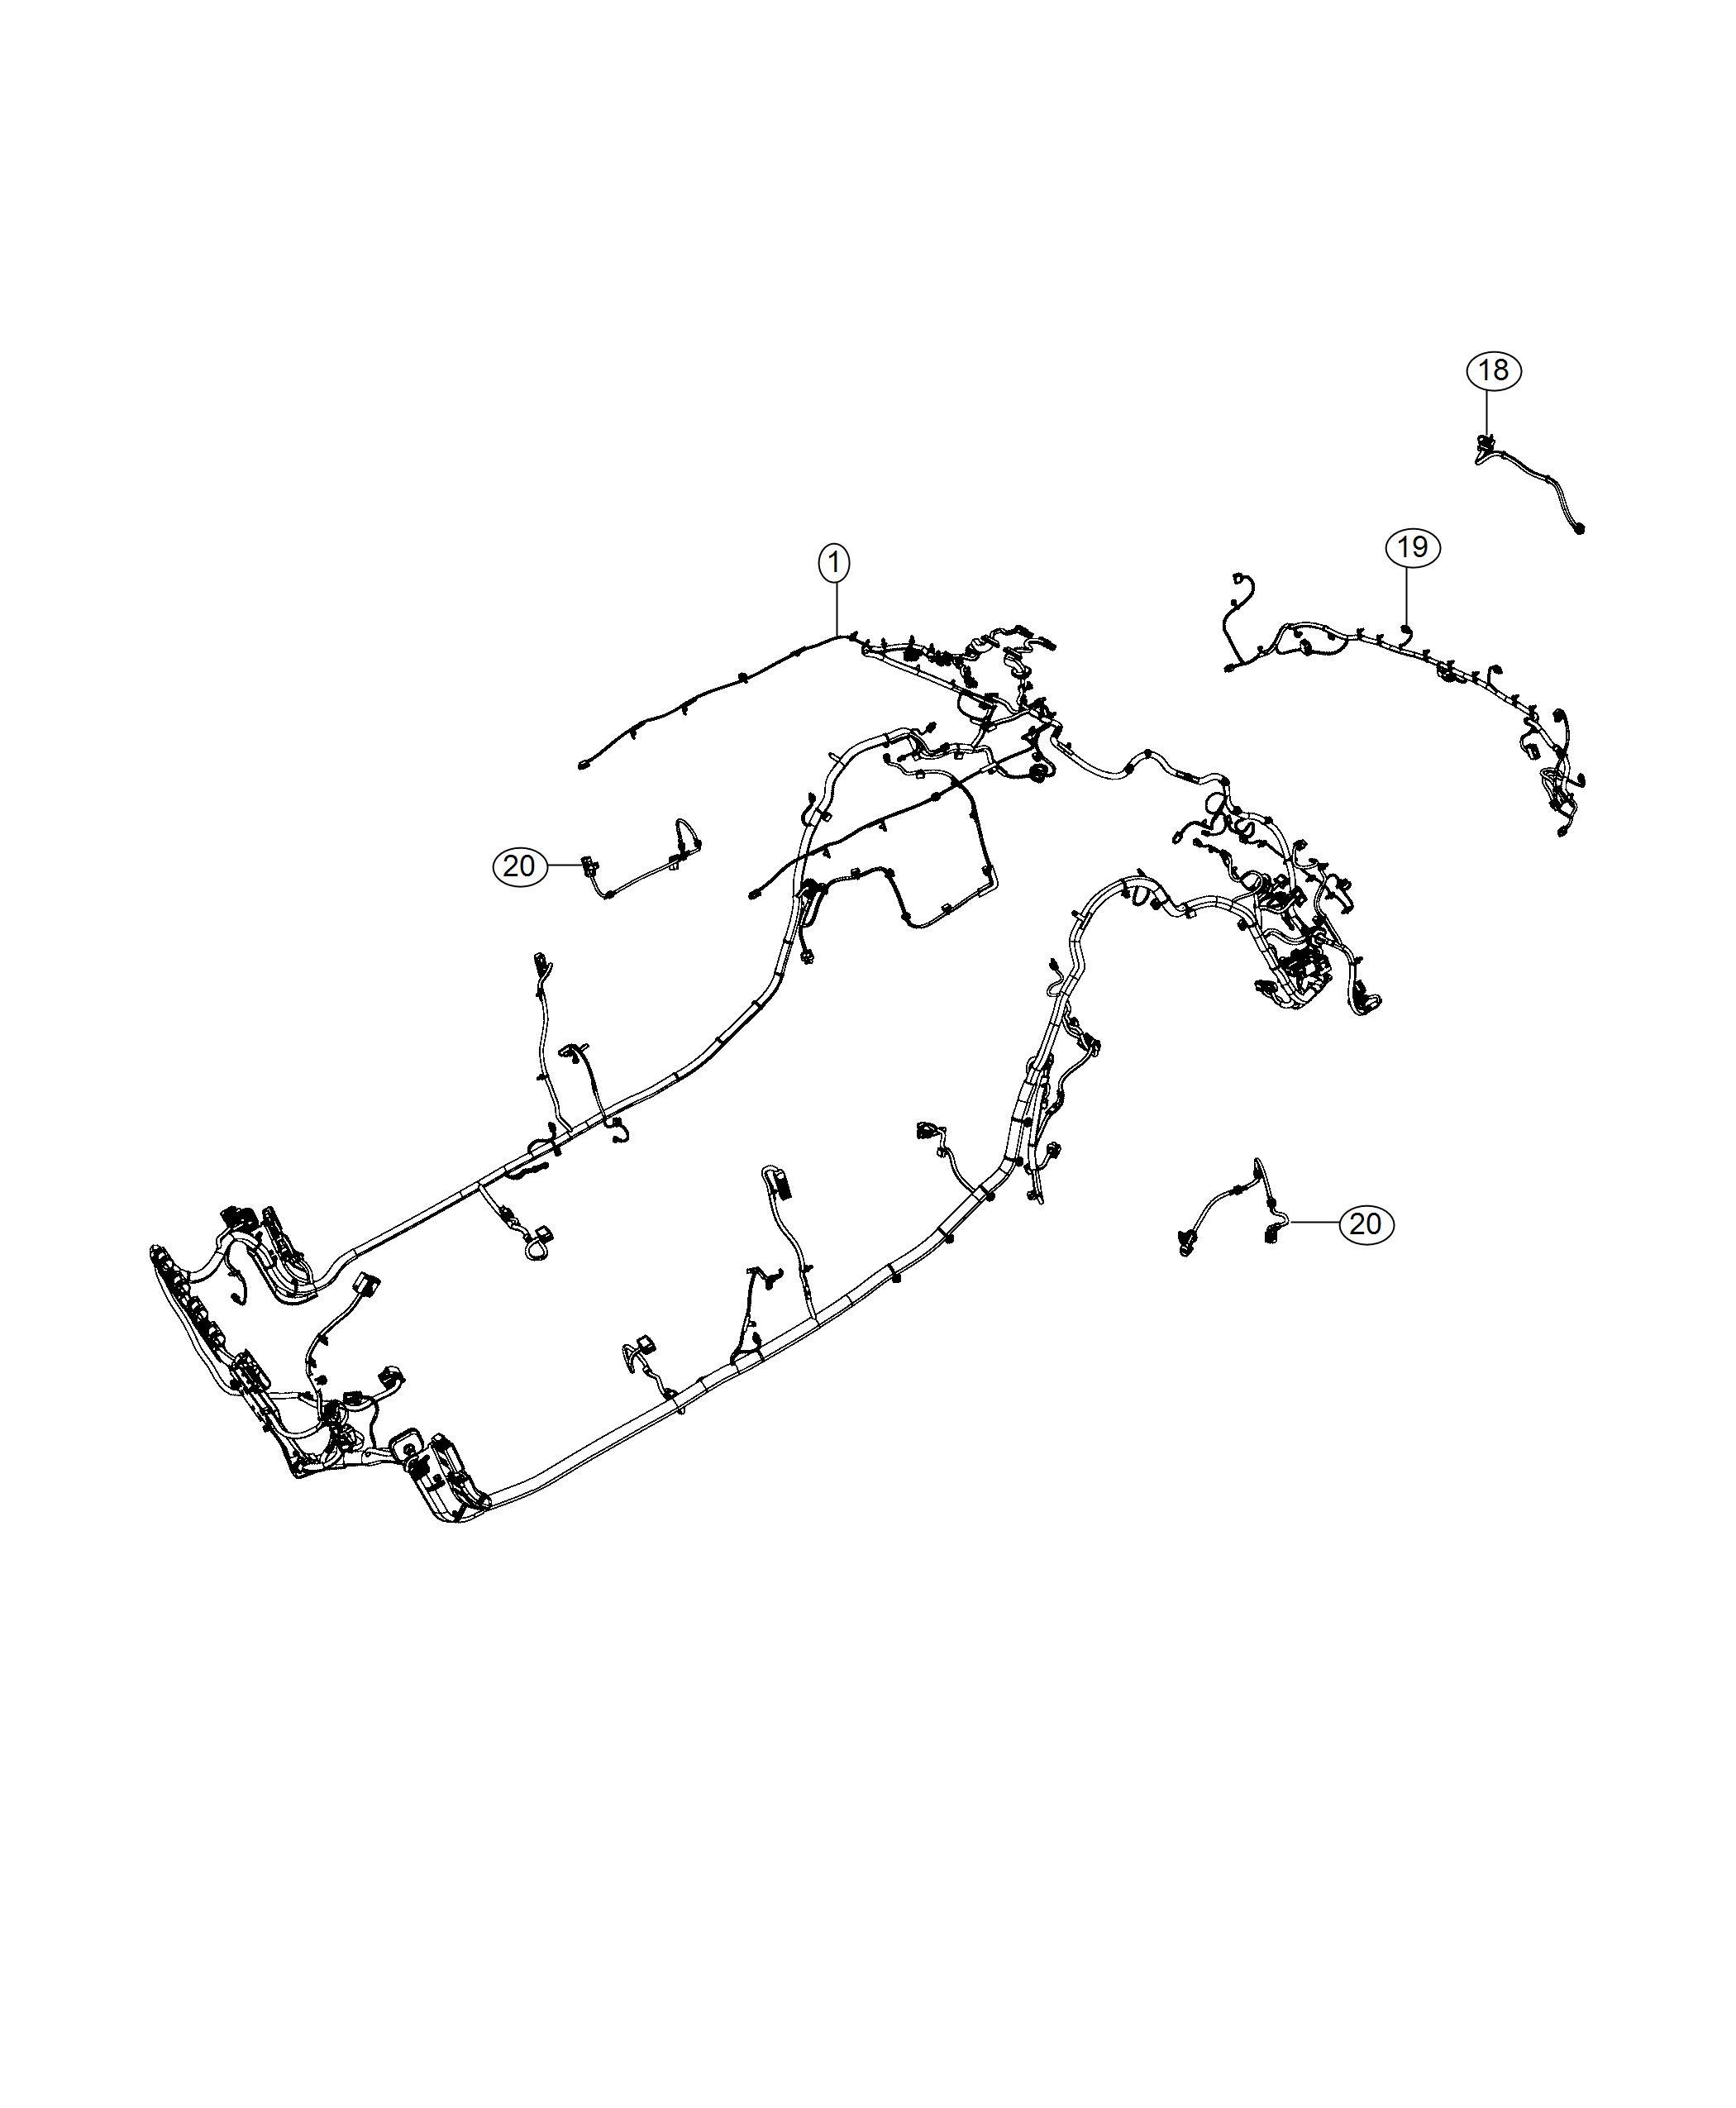 Jeep Compass Wiring Body Jrc Selec Terrain Tm